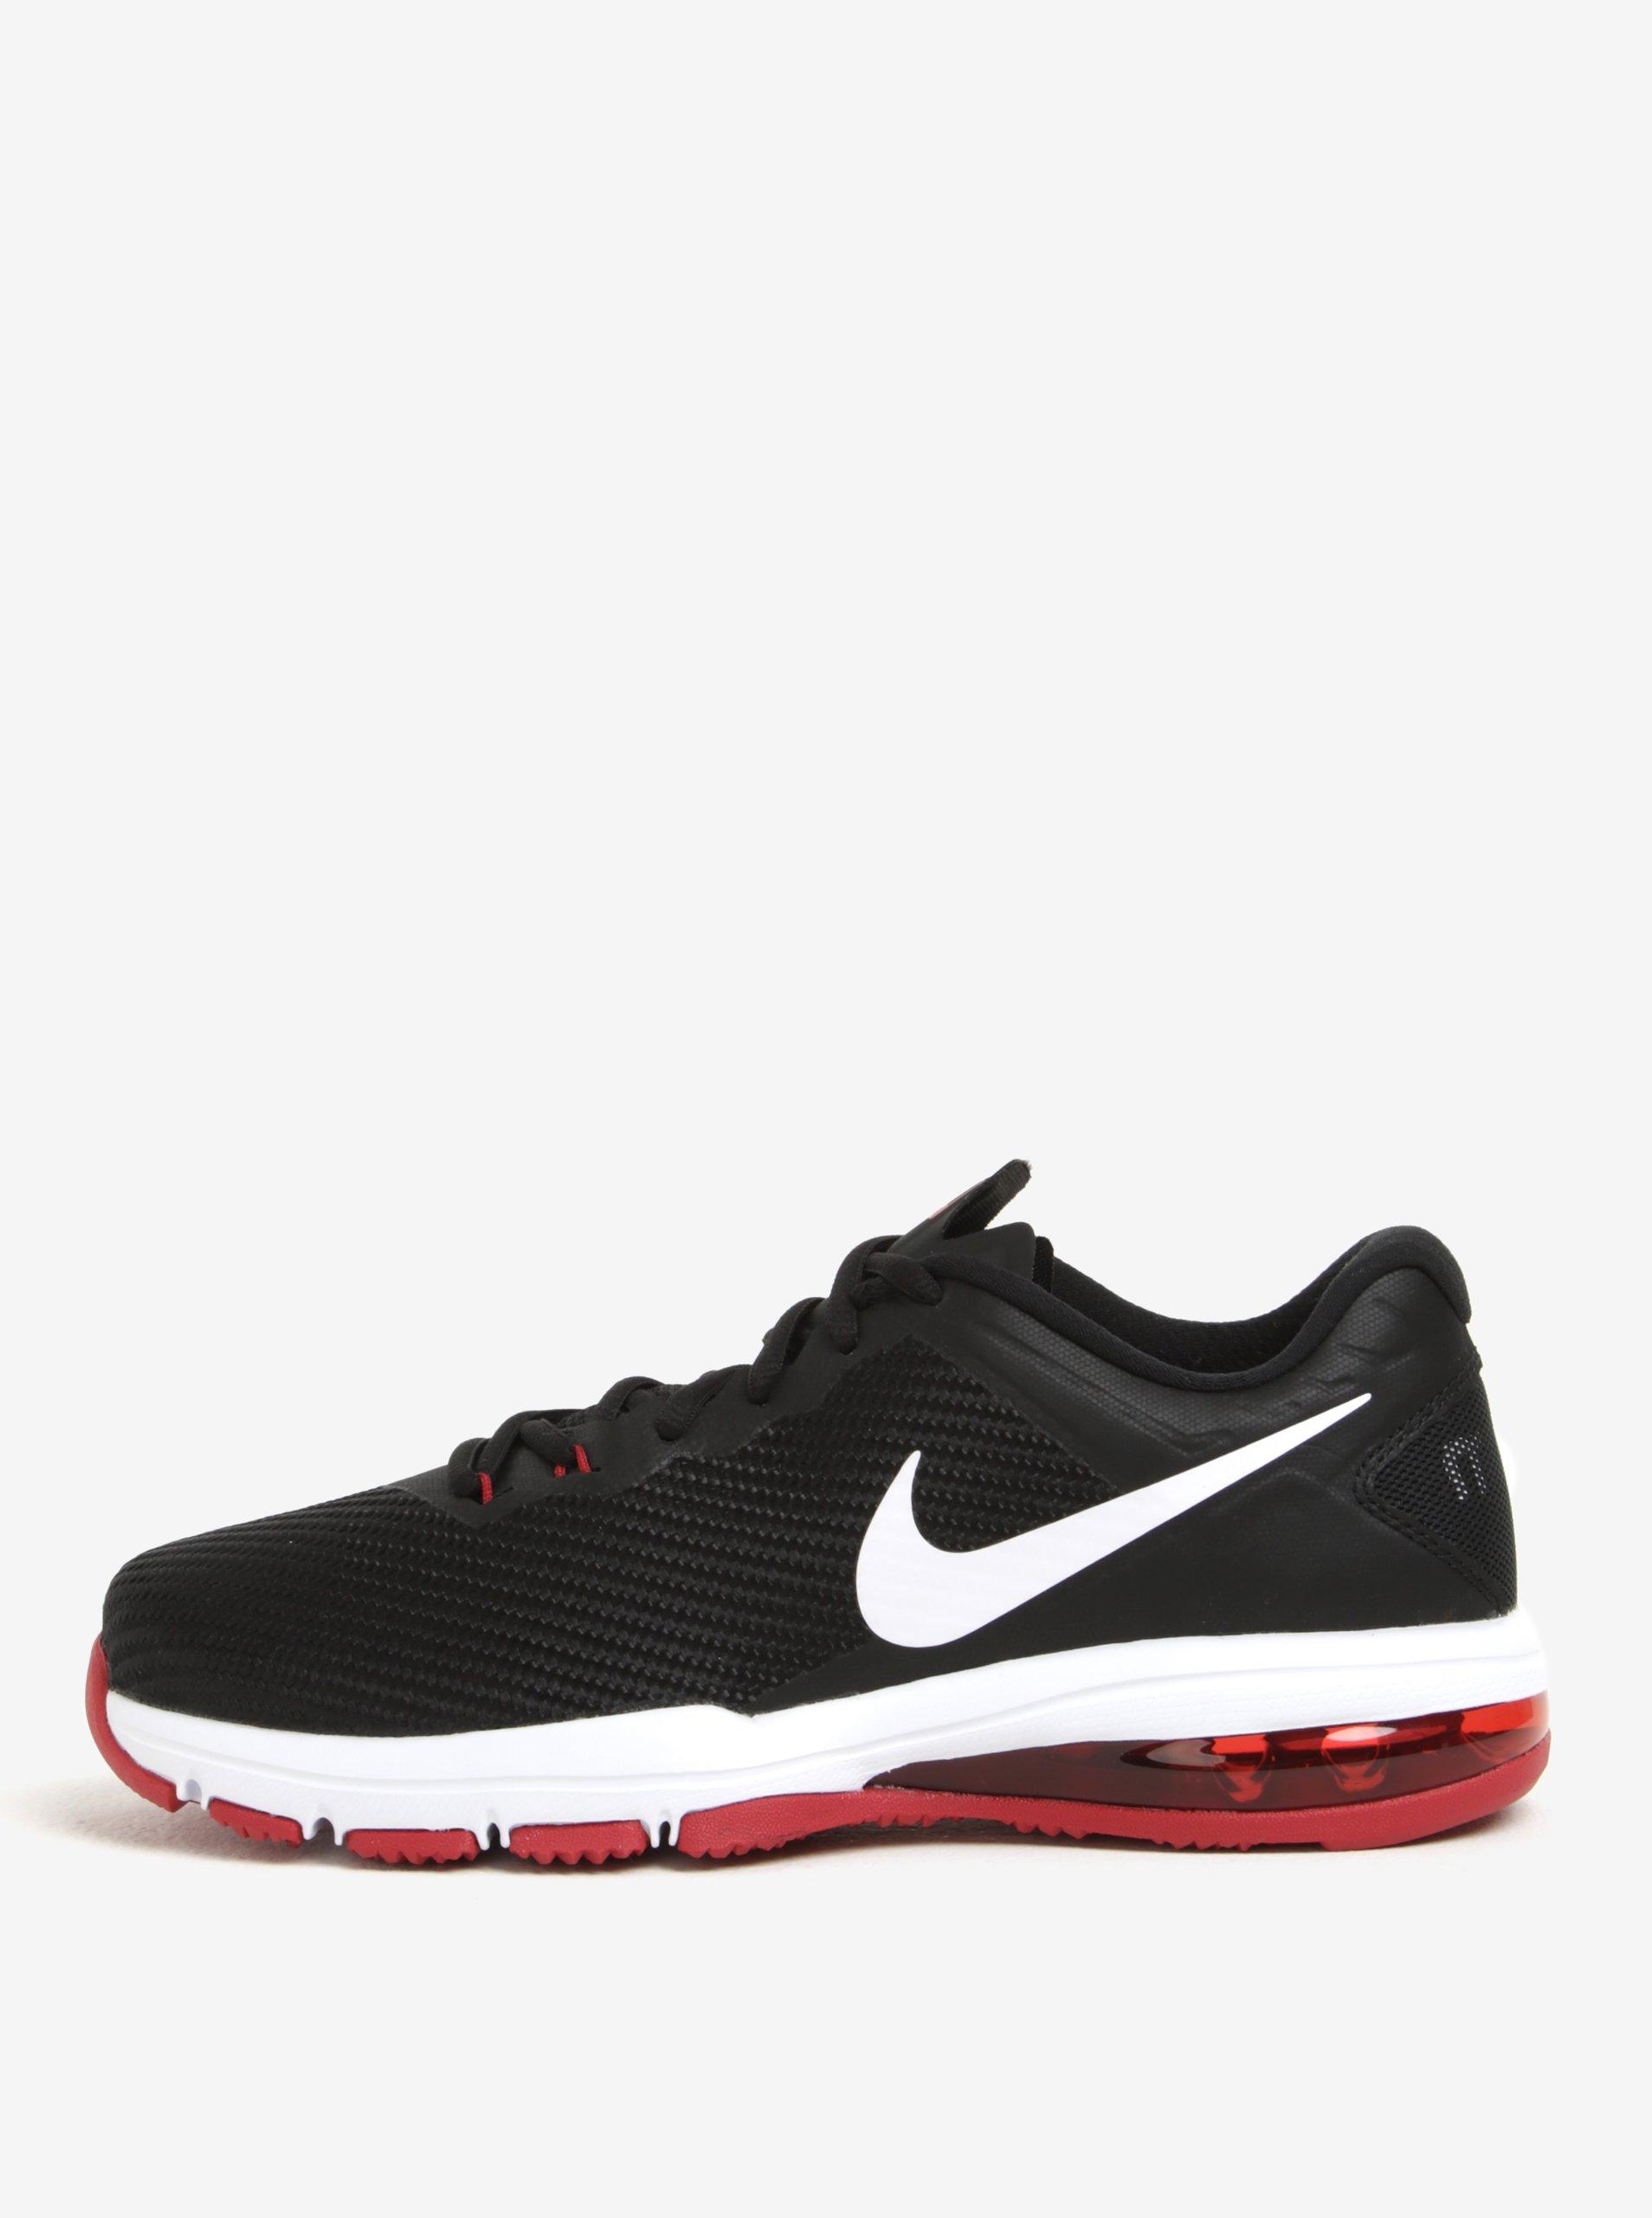 b8edf886cff Černé pánské tenisky Nike Air Max Full Ride